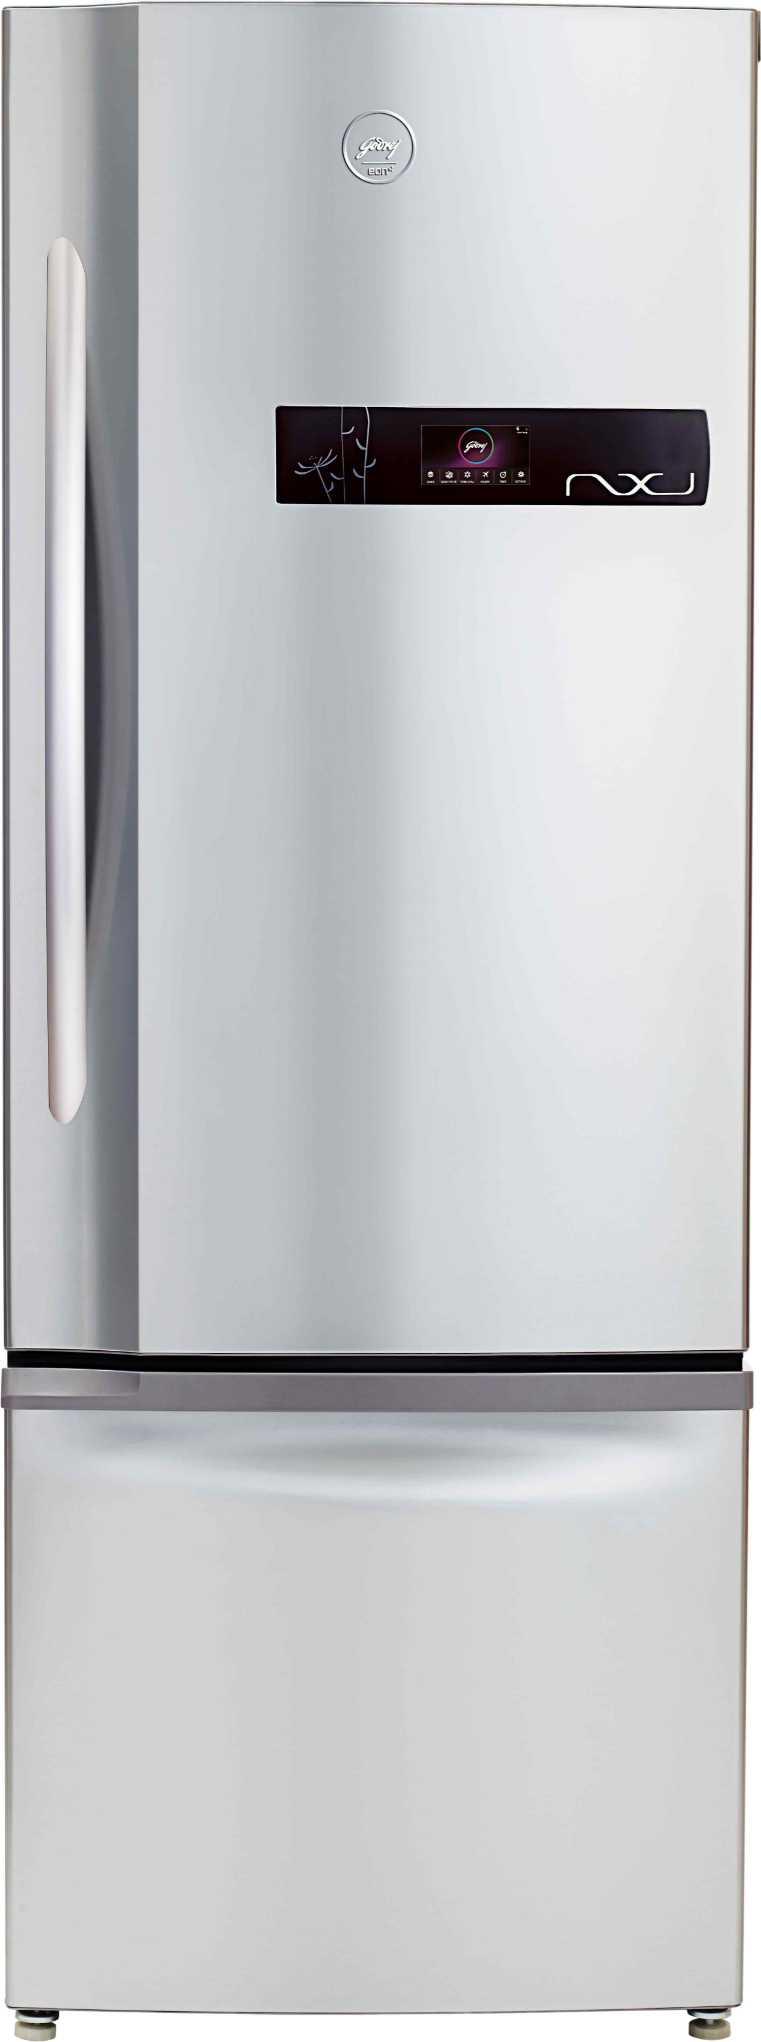 Best price on Godrej RB EON NXW 380 SD 380 Litre Double Door Refrigerator (Inox/Cosmos) in India